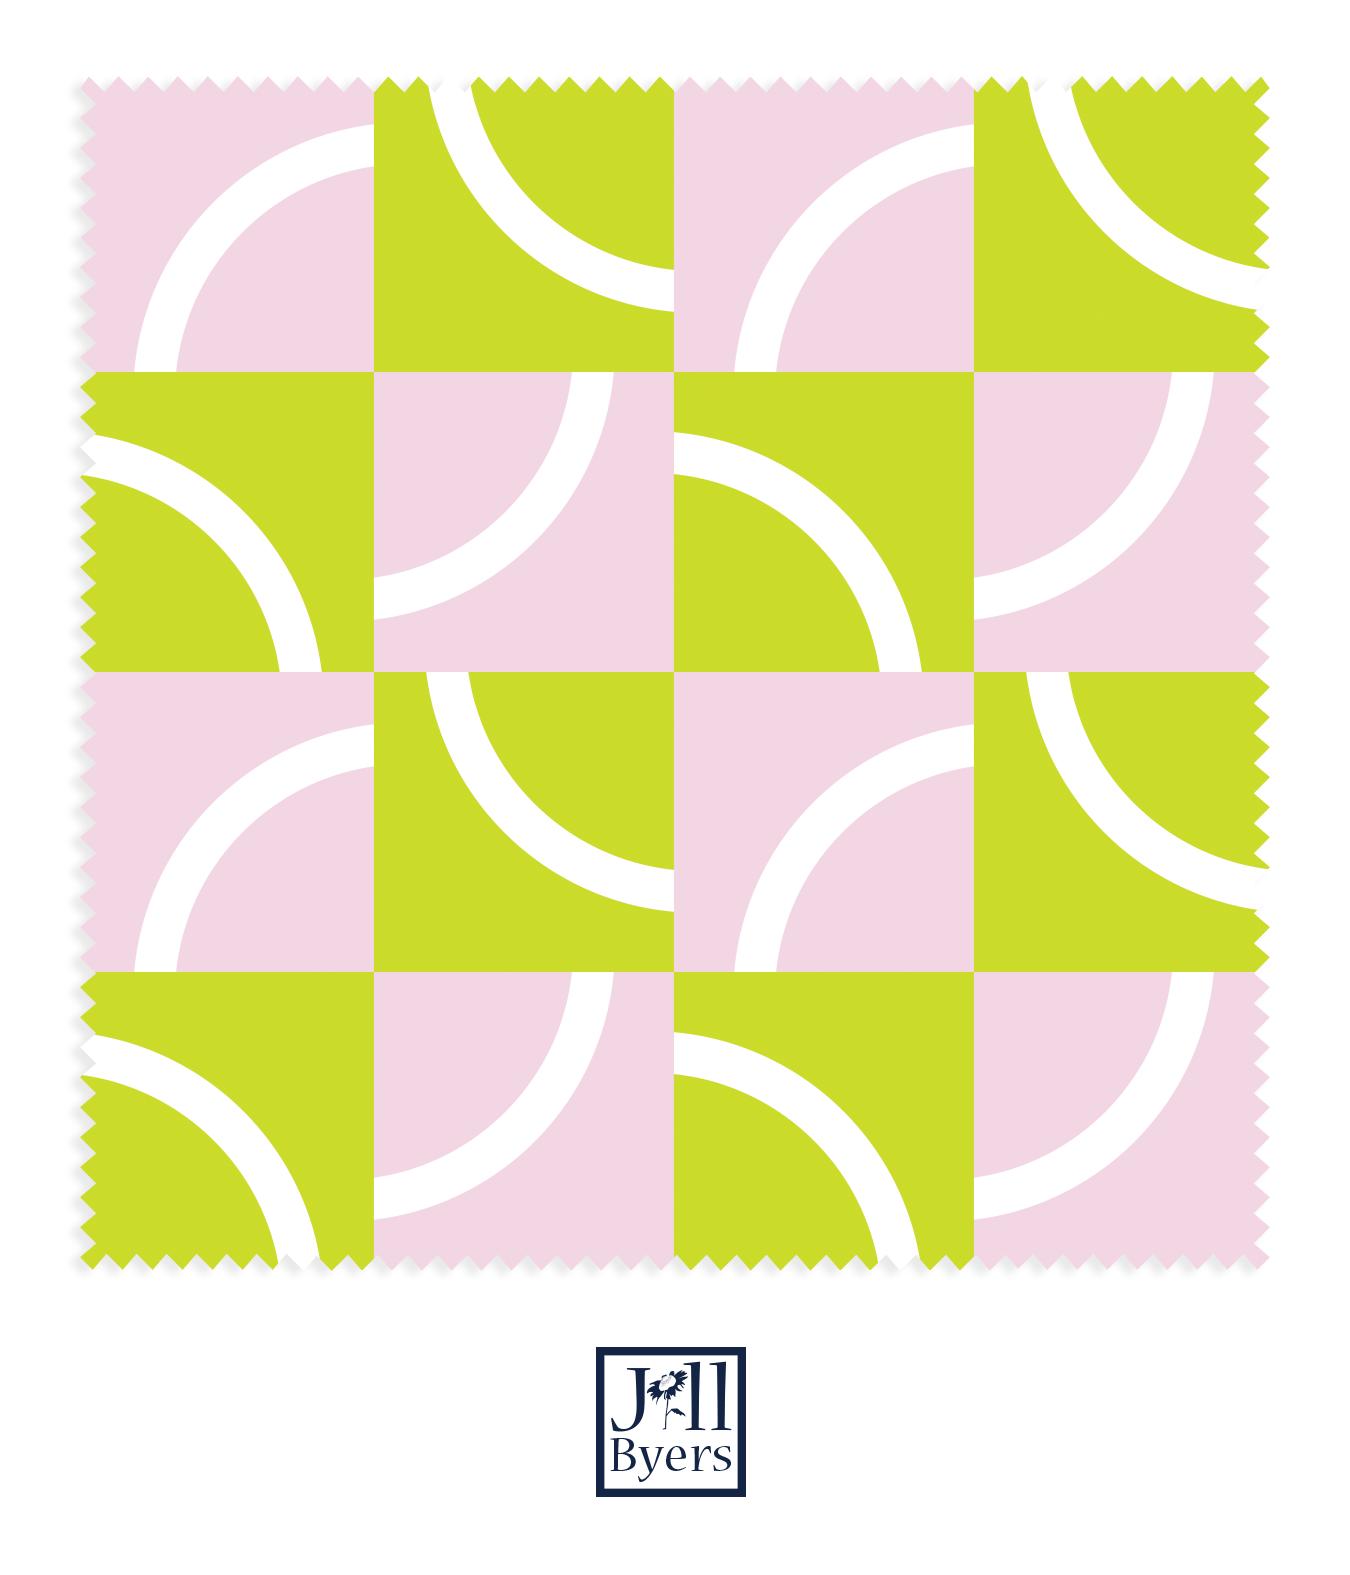 http://www.spoonflower.com/designs/3348740